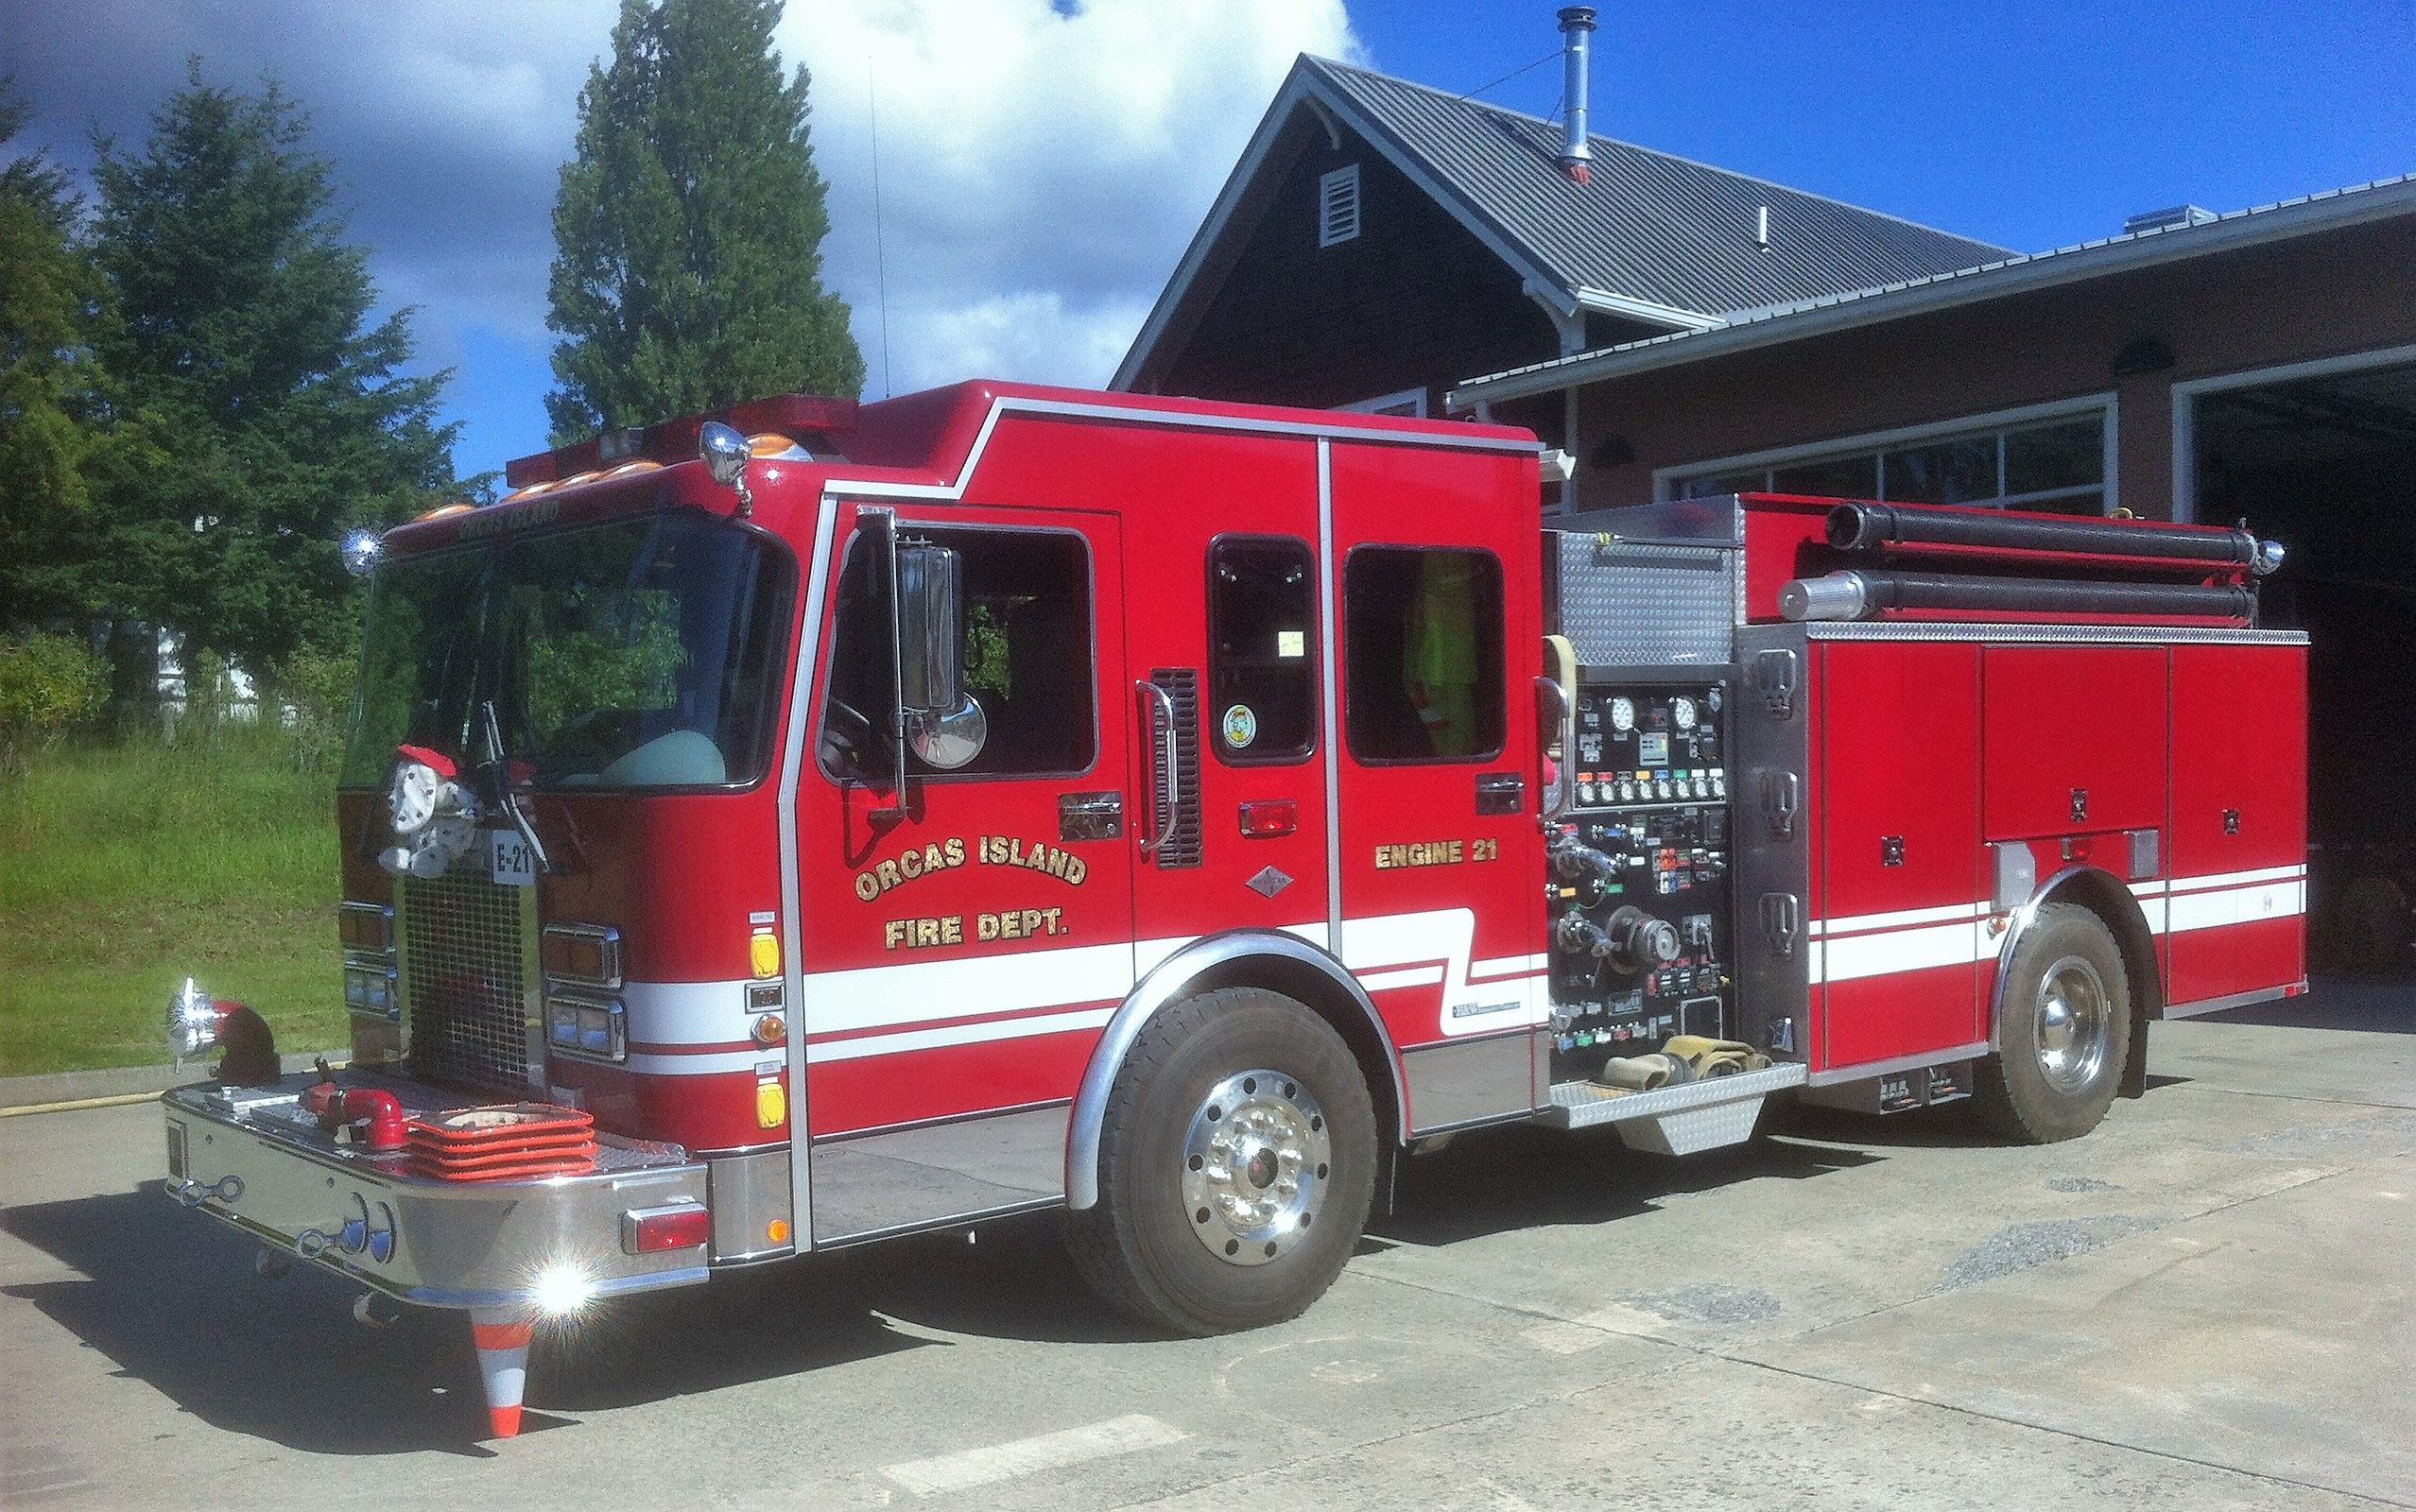 orcas island fire rescue engine 21 1999 spartan h w 1250 1000 cafs engine  [ 2556 x 1600 Pixel ]